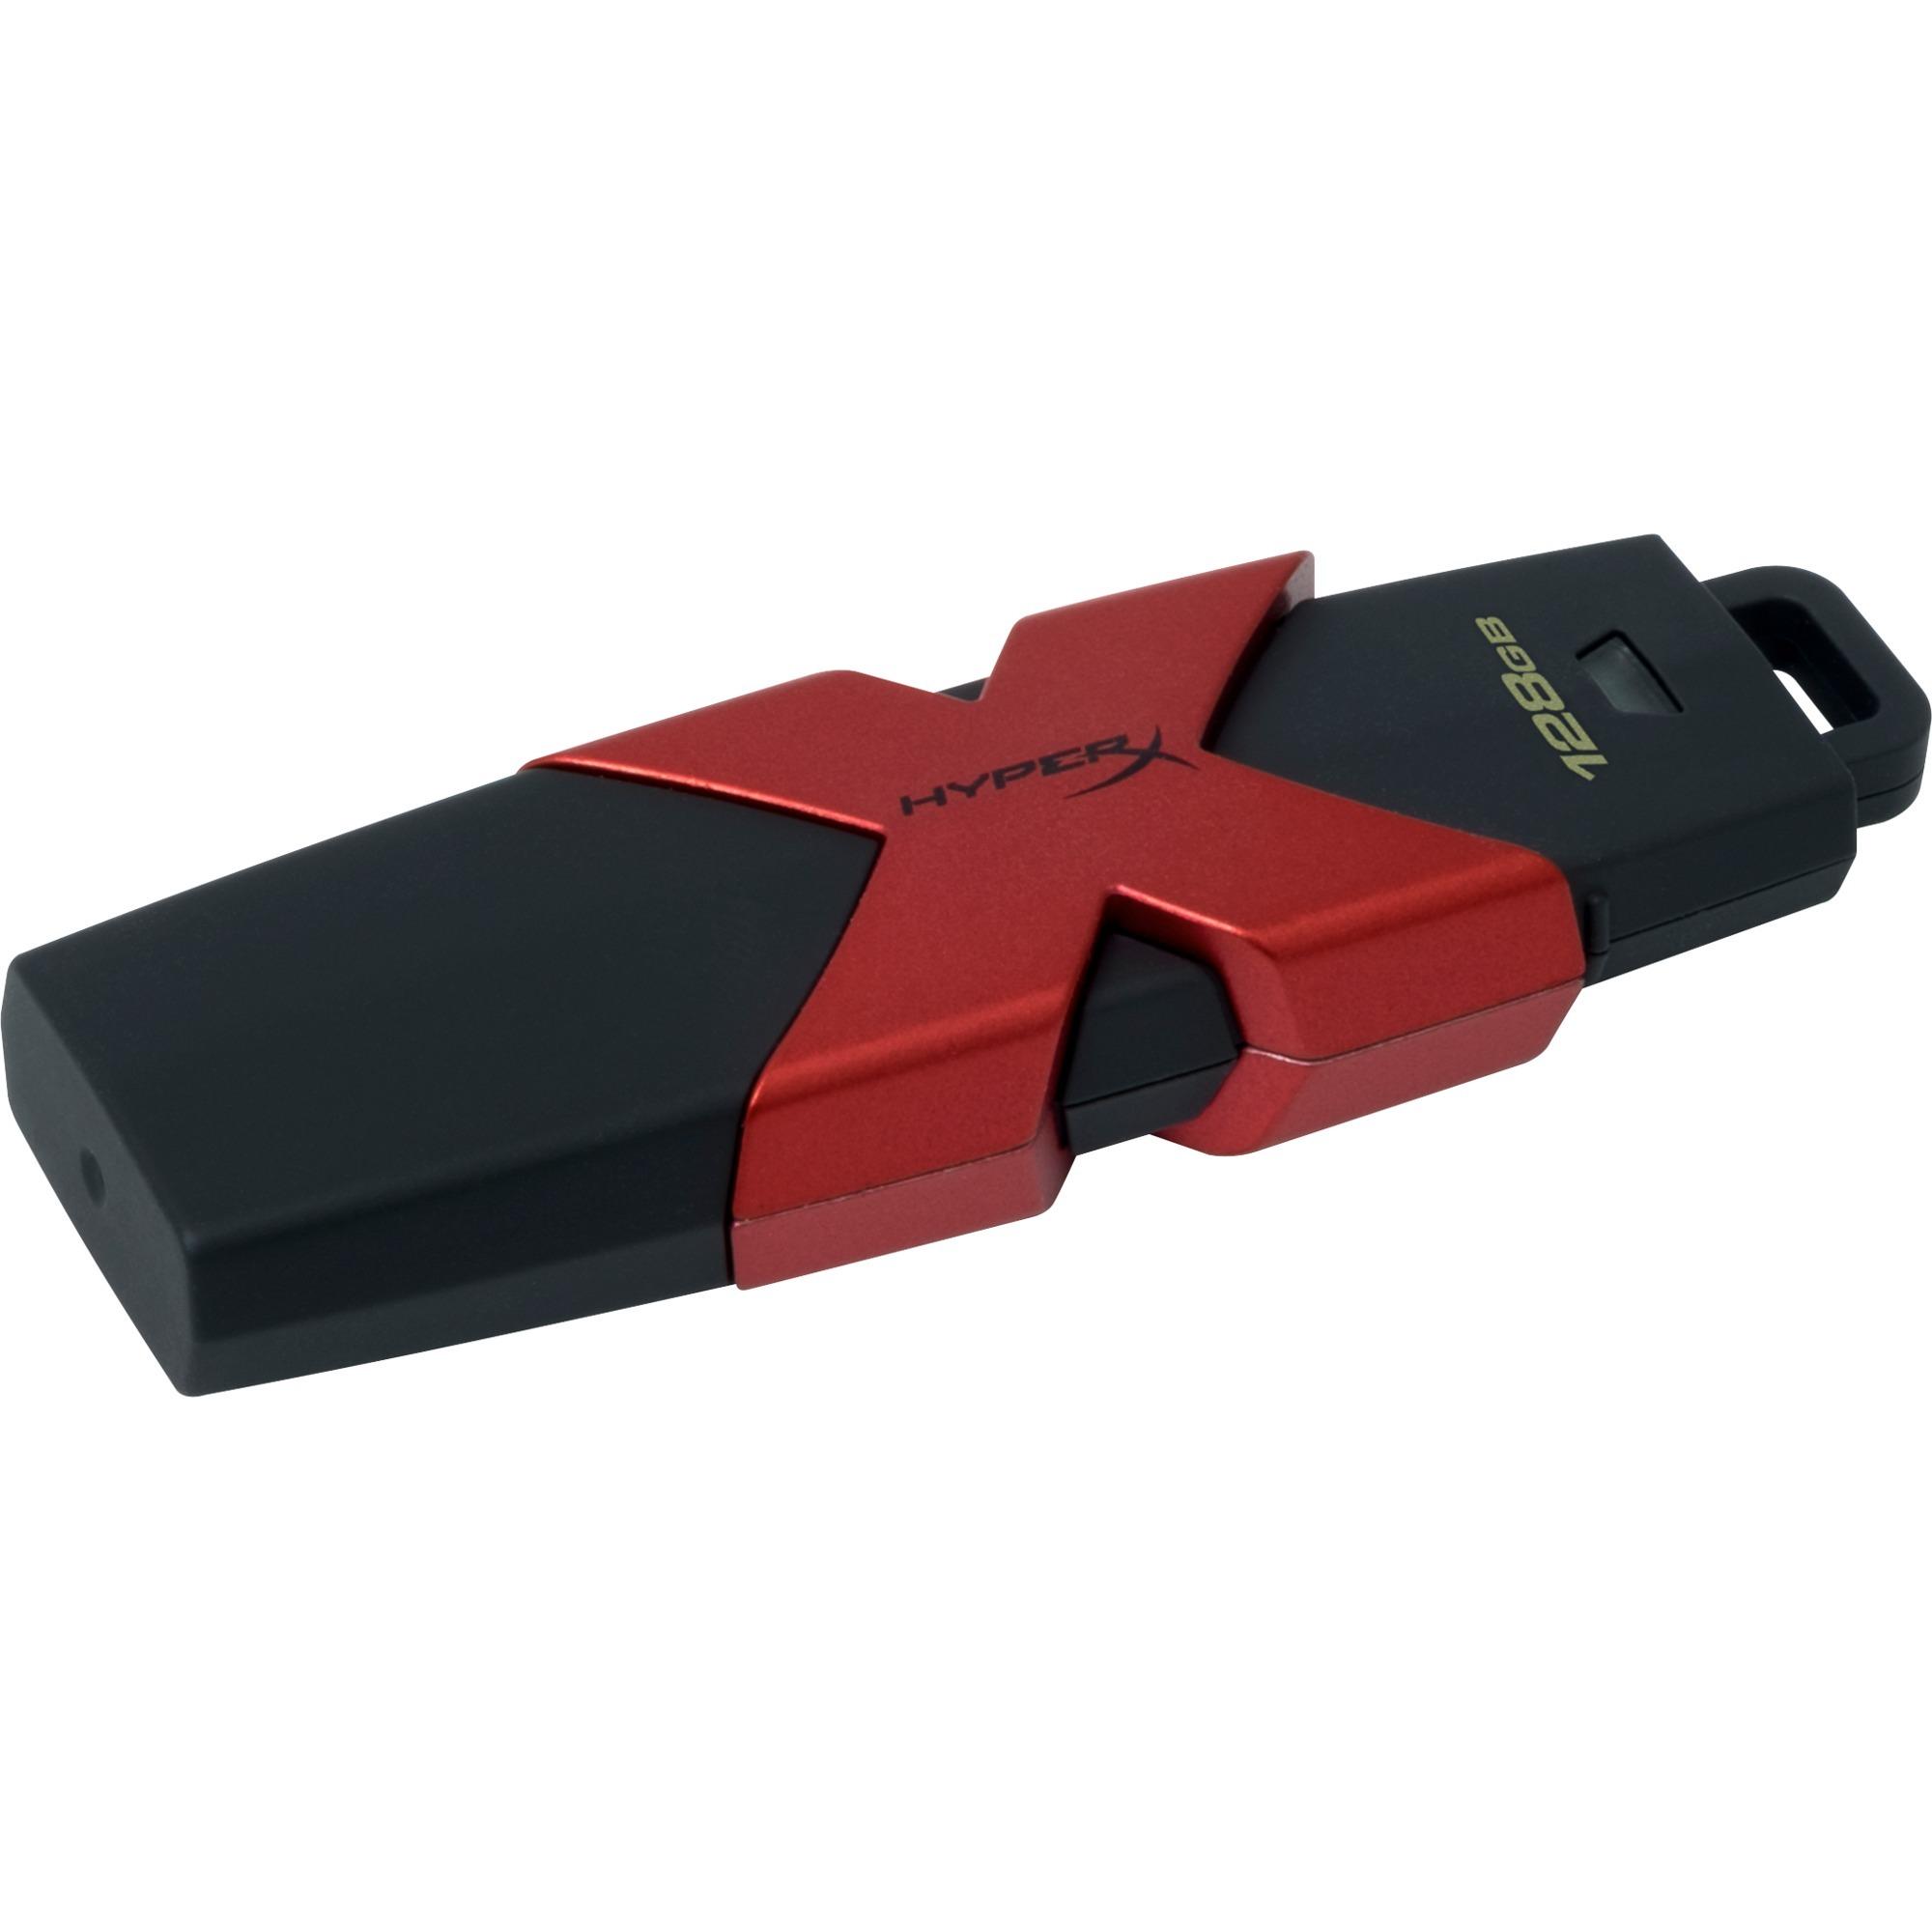 128GB 128GB USB 3.0 (3.1 Gen 1) Conector USB Tipo A Negro, Rojo unidad flash USB, Lápiz USB